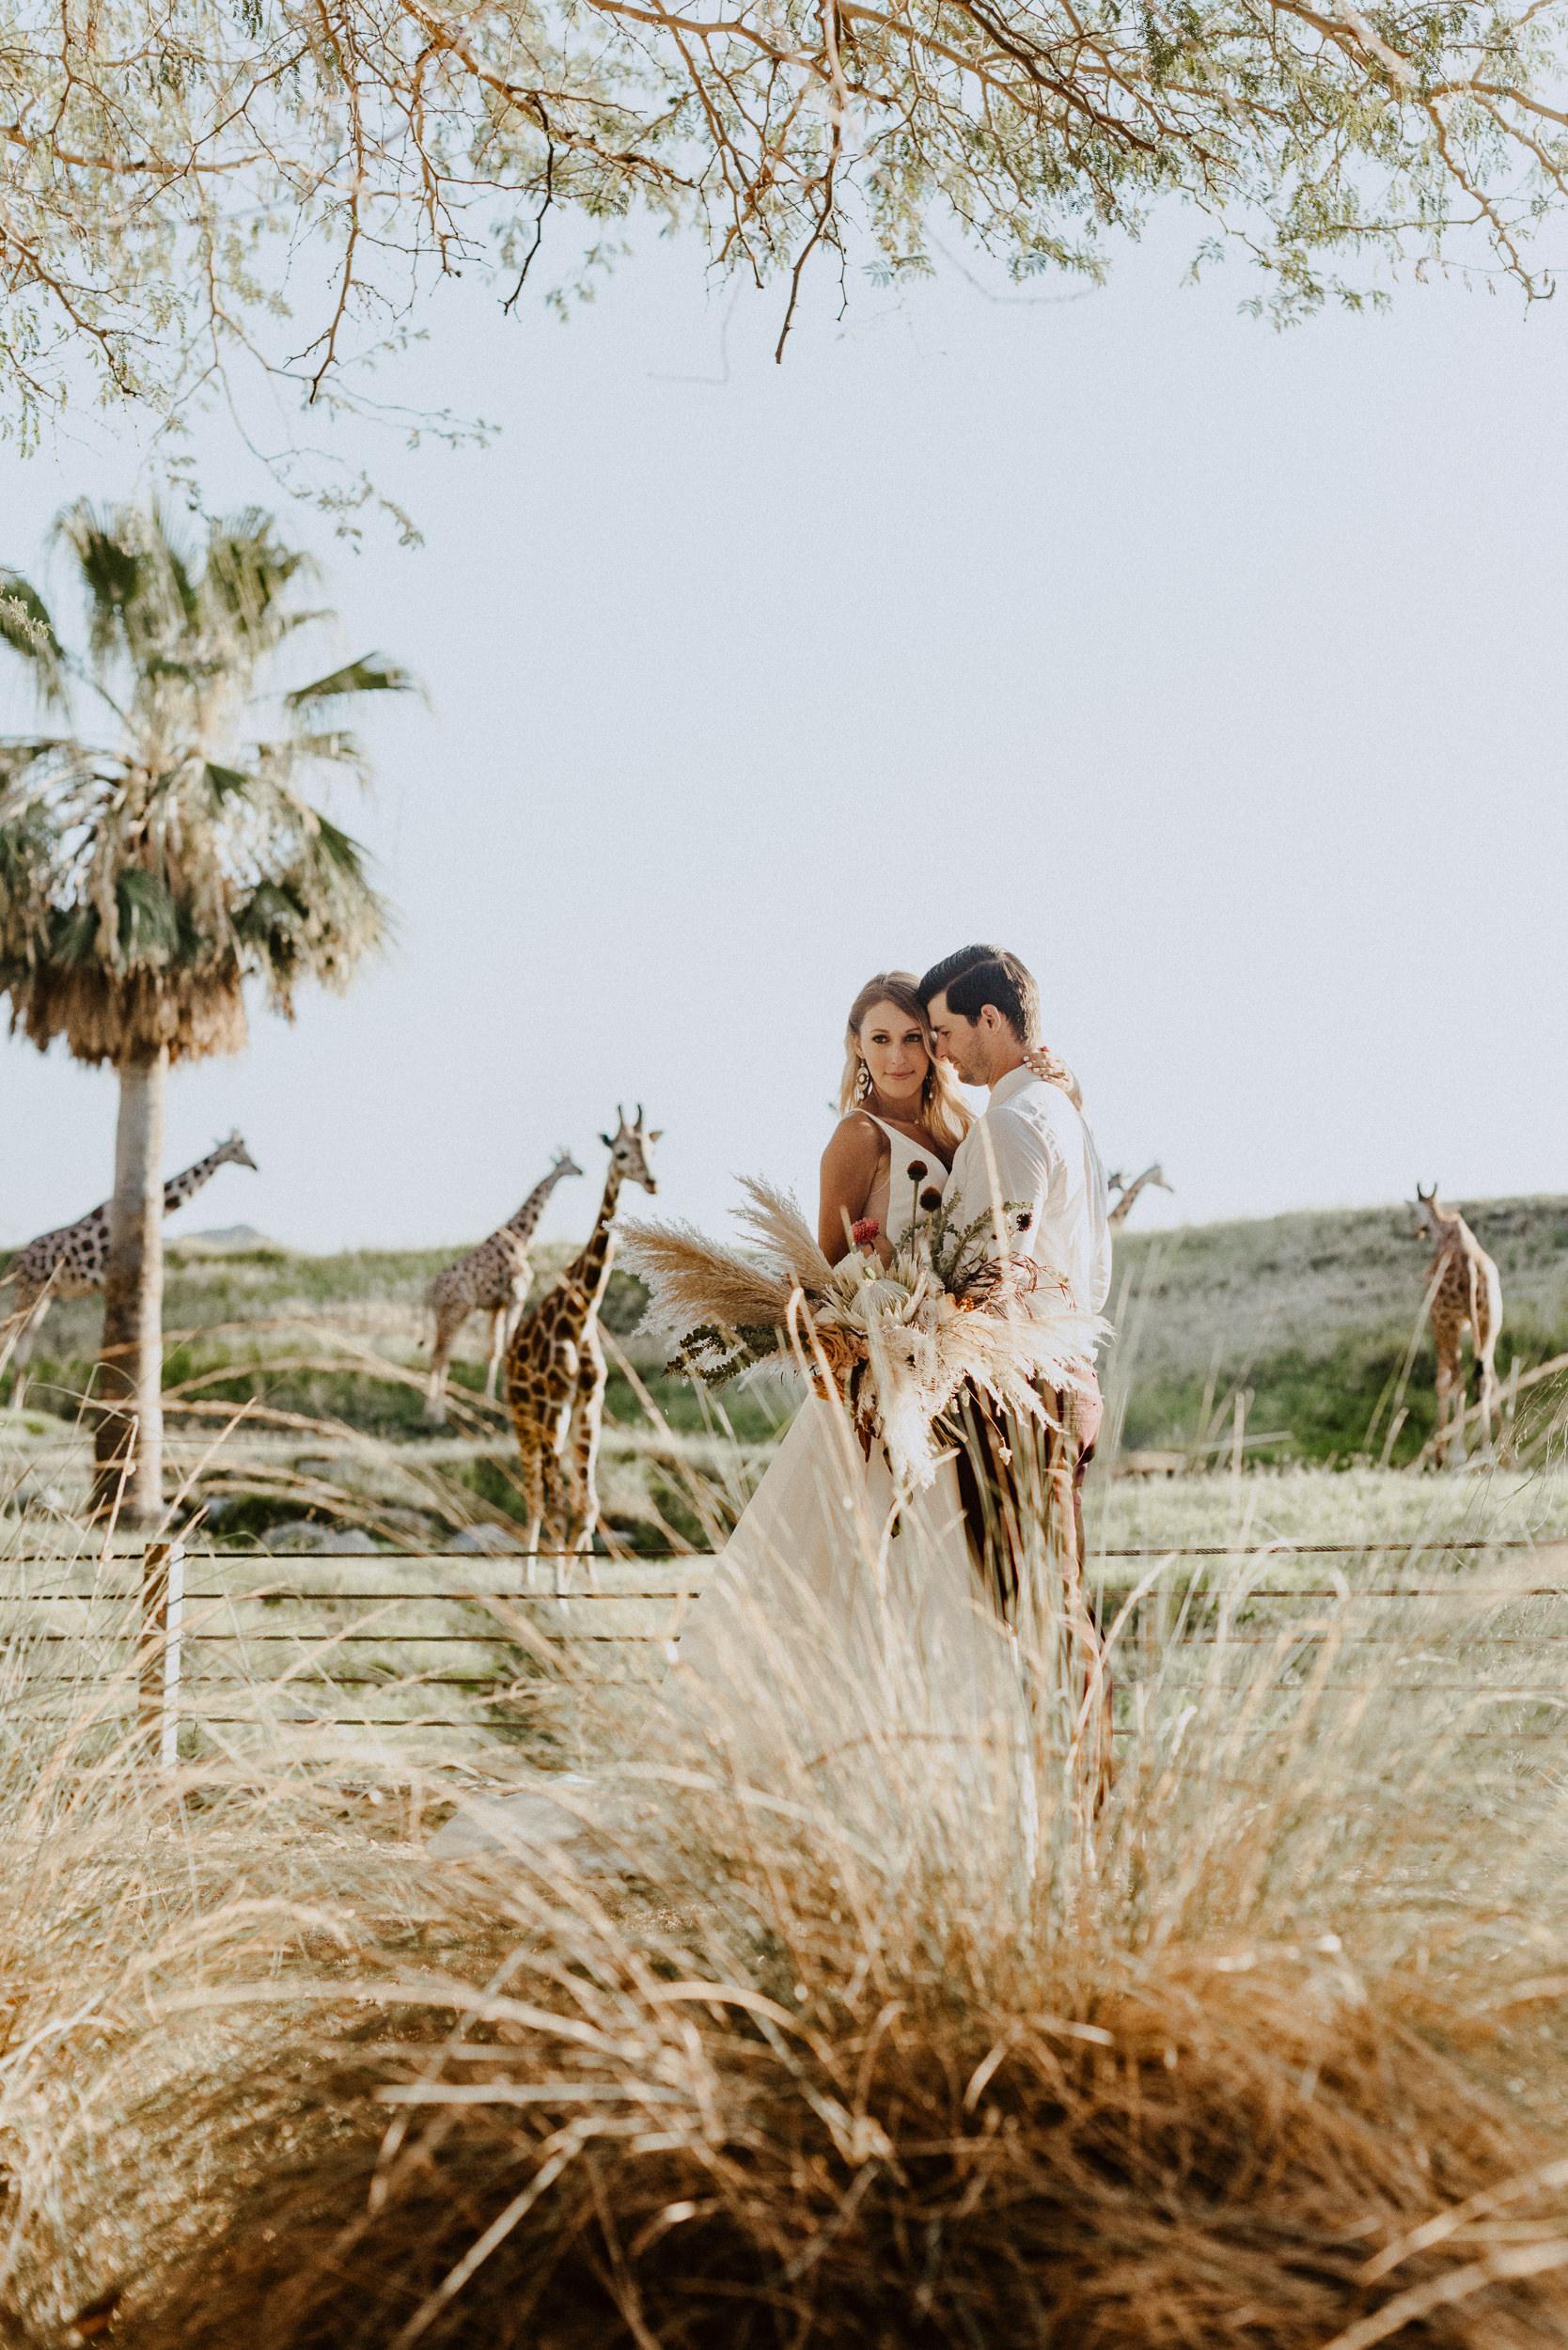 sChelsie + Chris - The Desert Shootout Wedding Romantics at The Living Desert-81.jpg